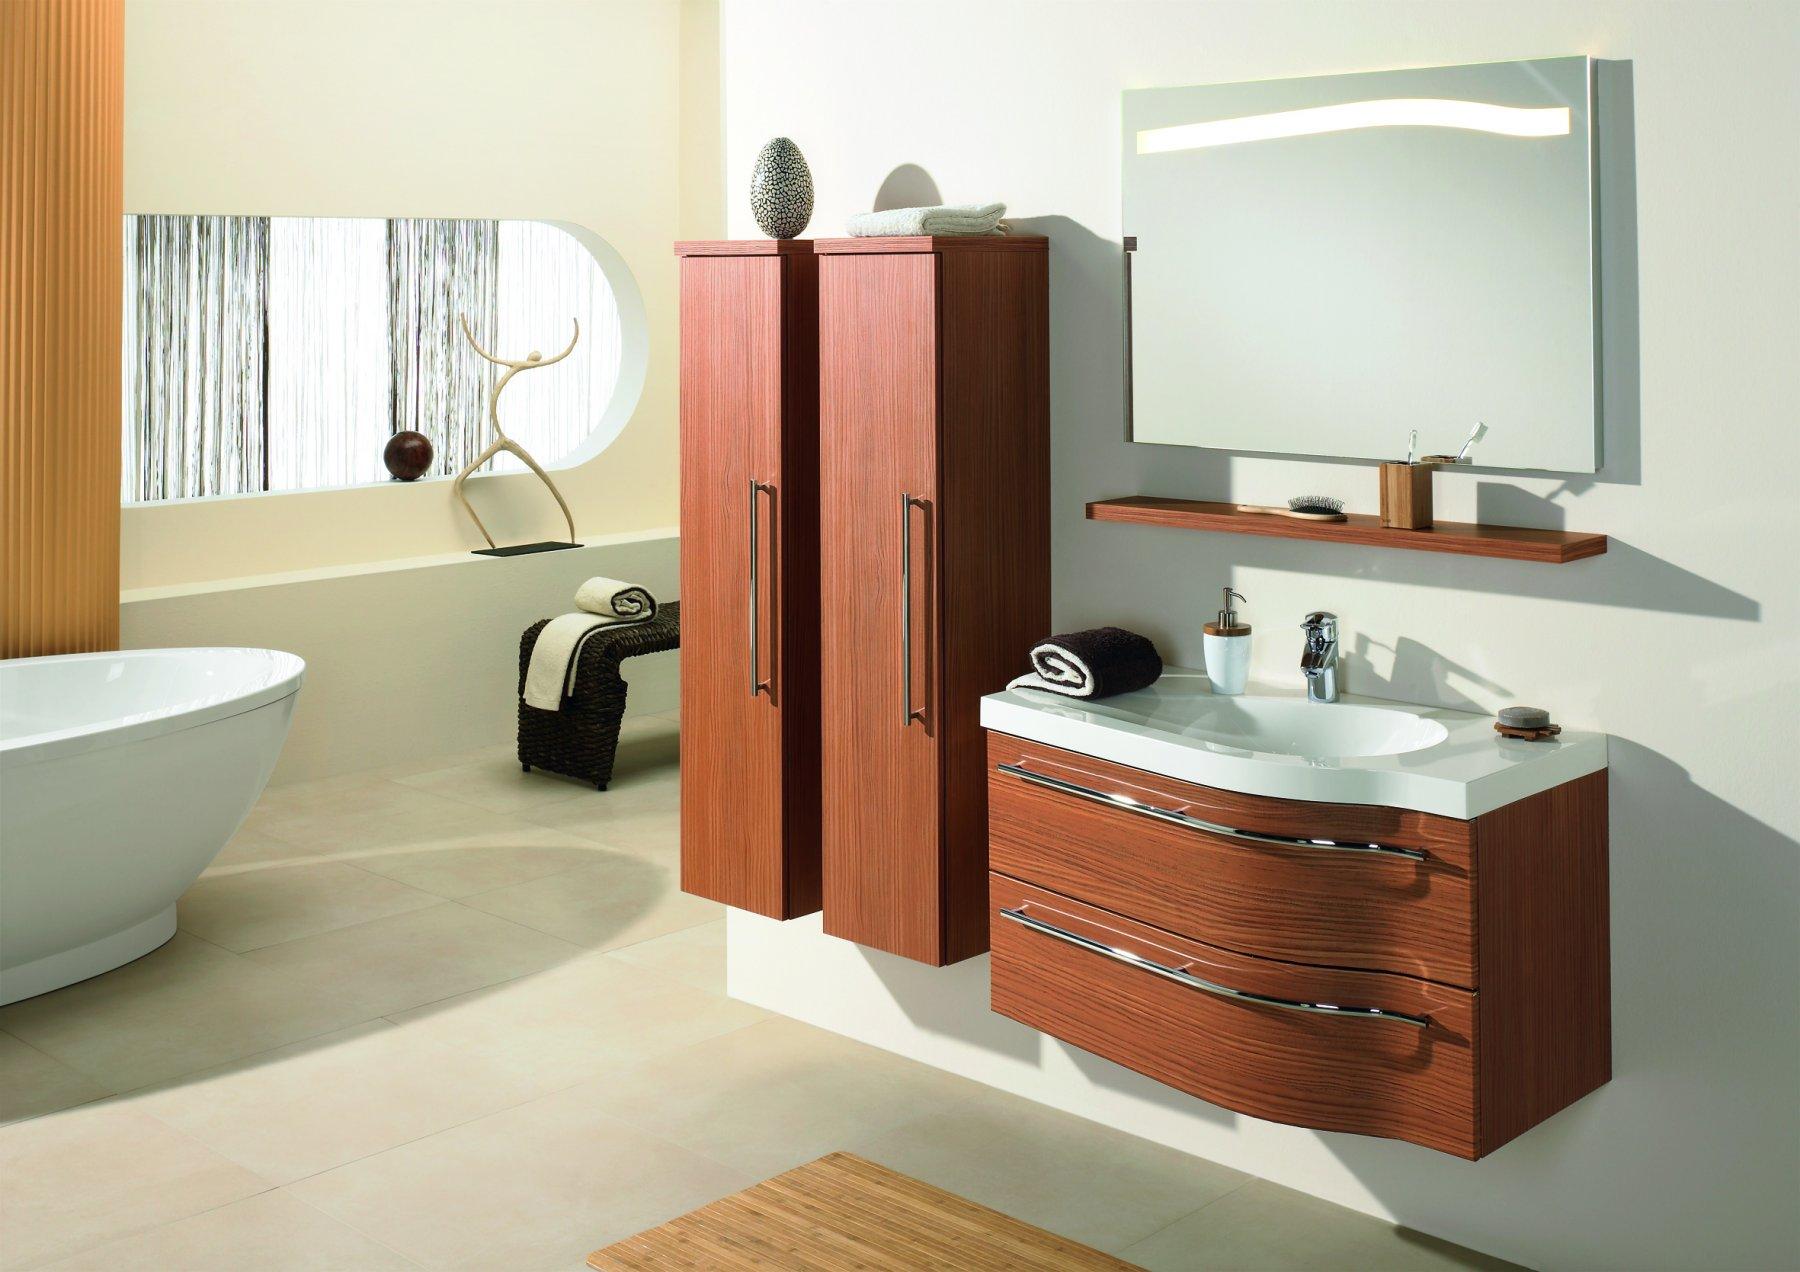 hochschrank swing badschrank g nstig. Black Bedroom Furniture Sets. Home Design Ideas